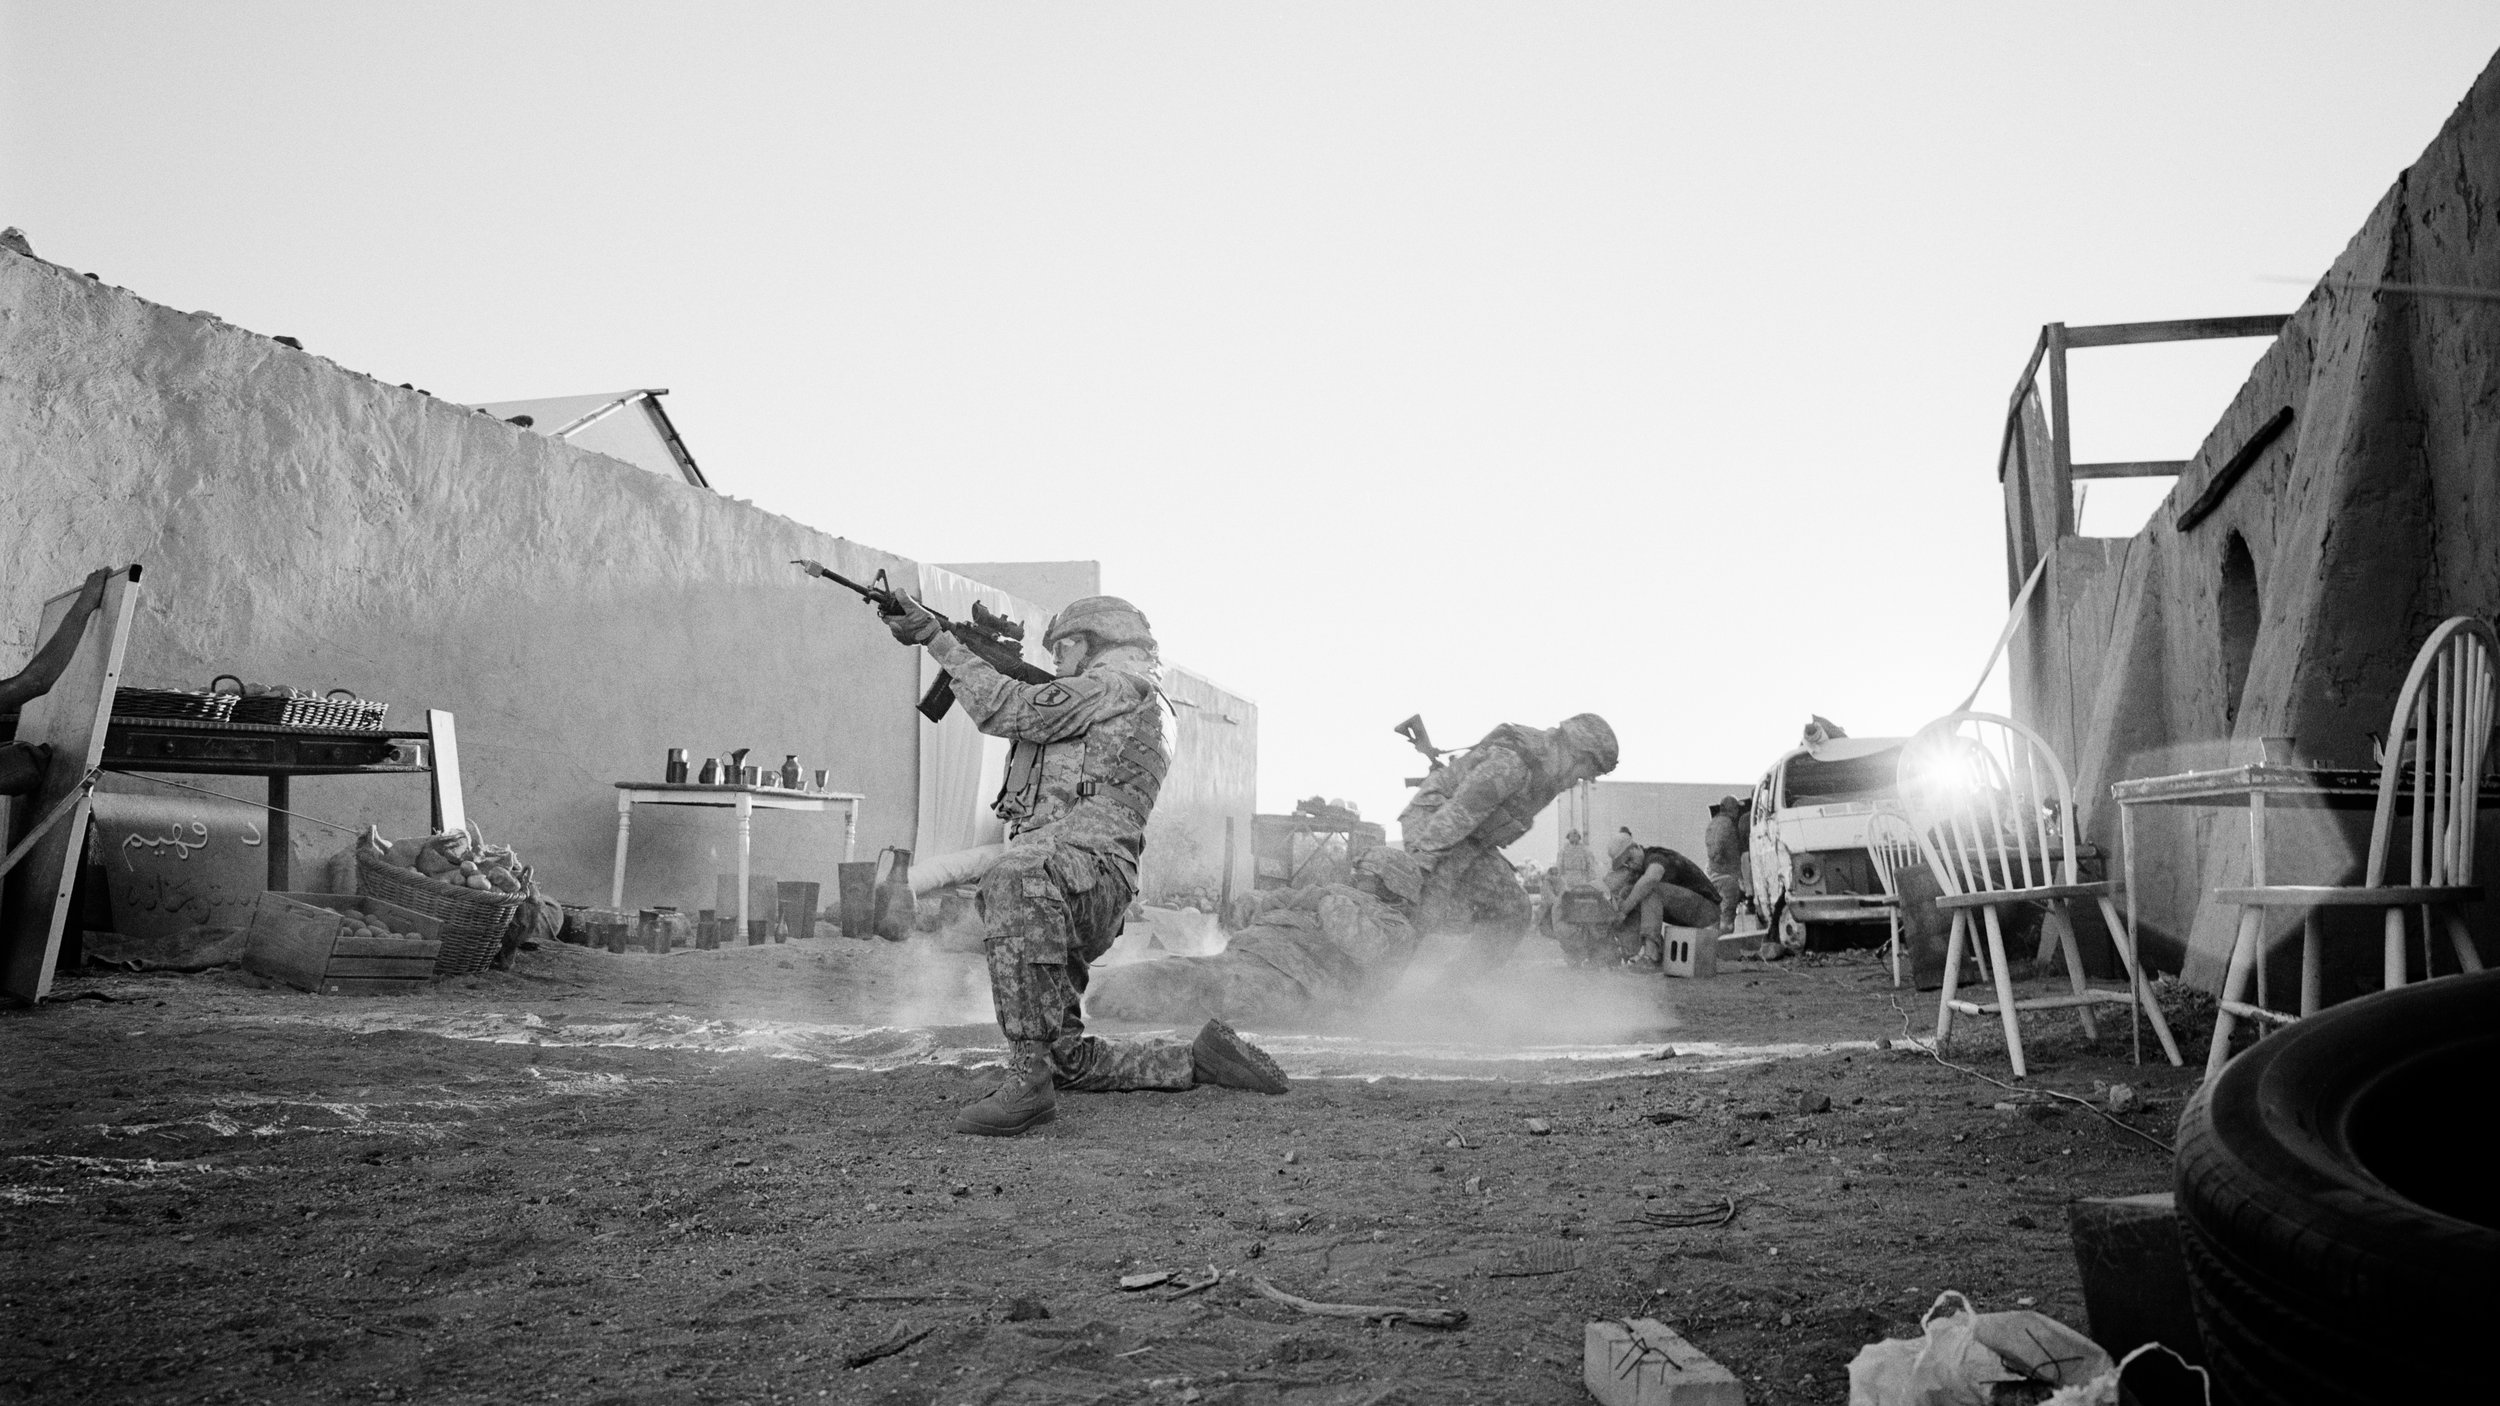 Fort Irwin_63.jpg